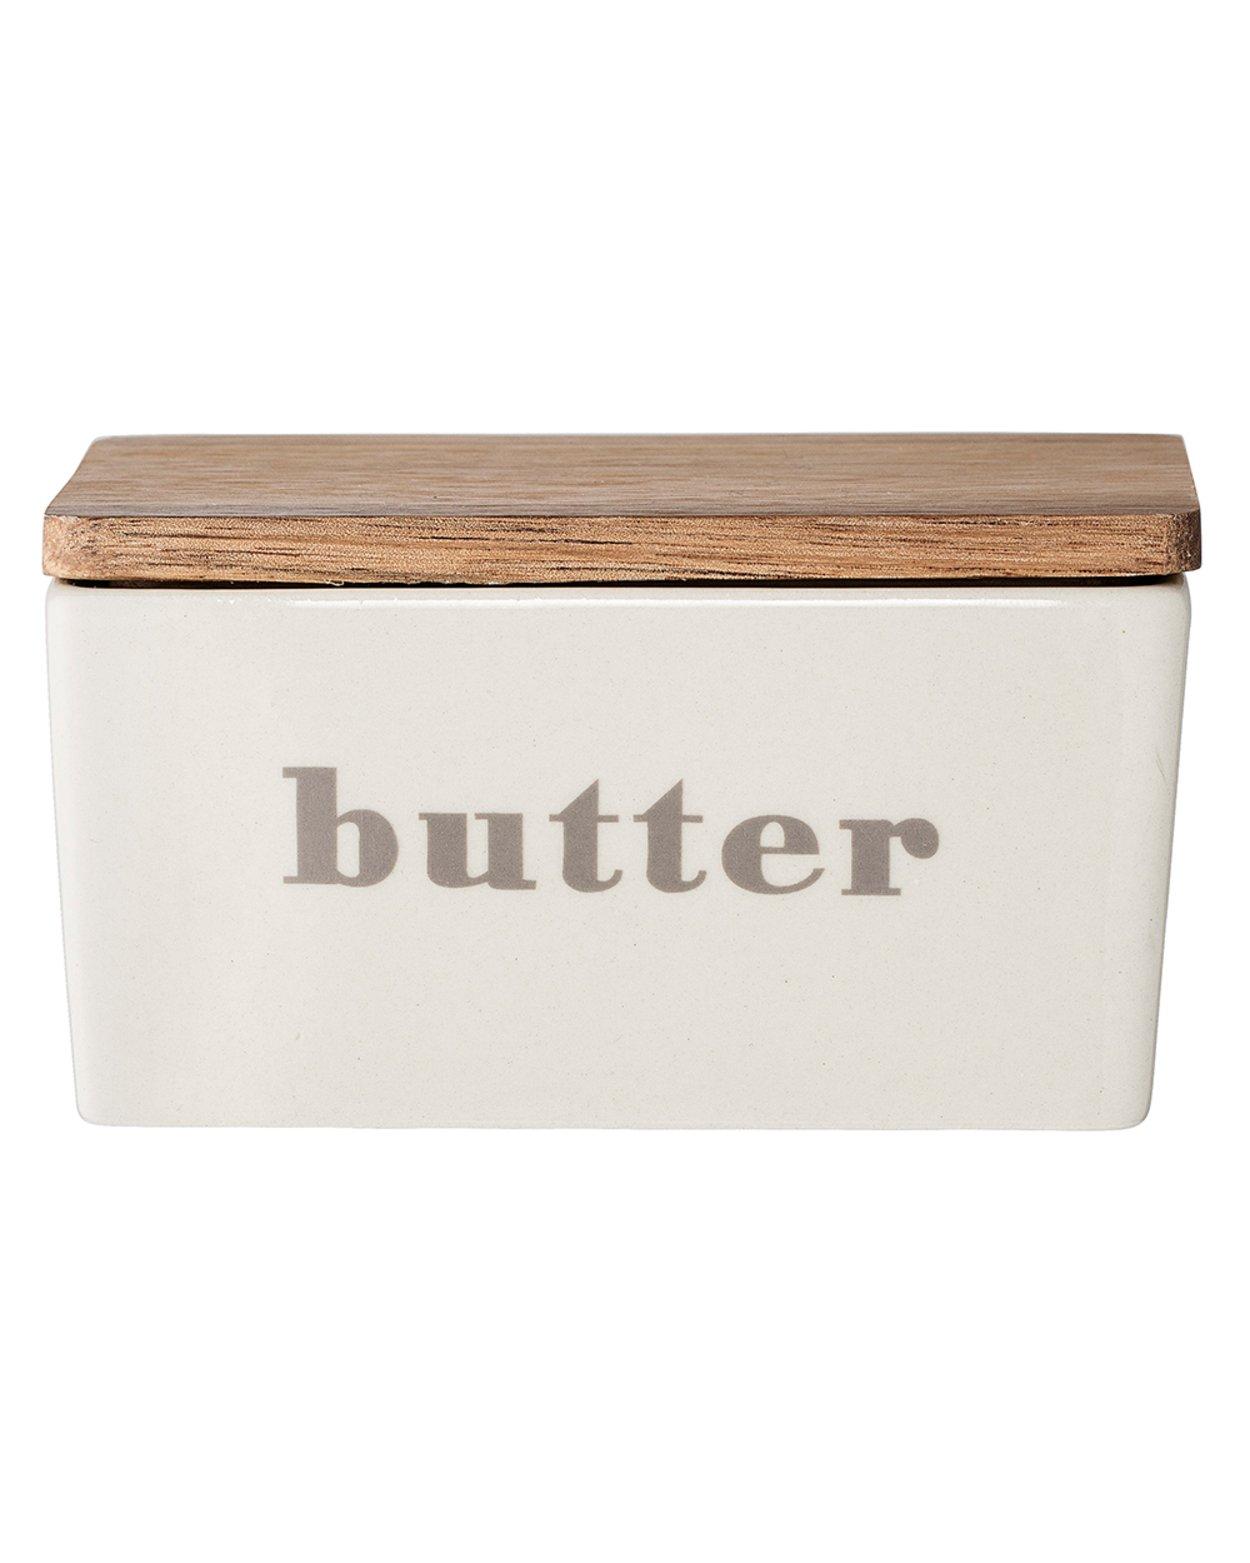 Hanyu Butter Box